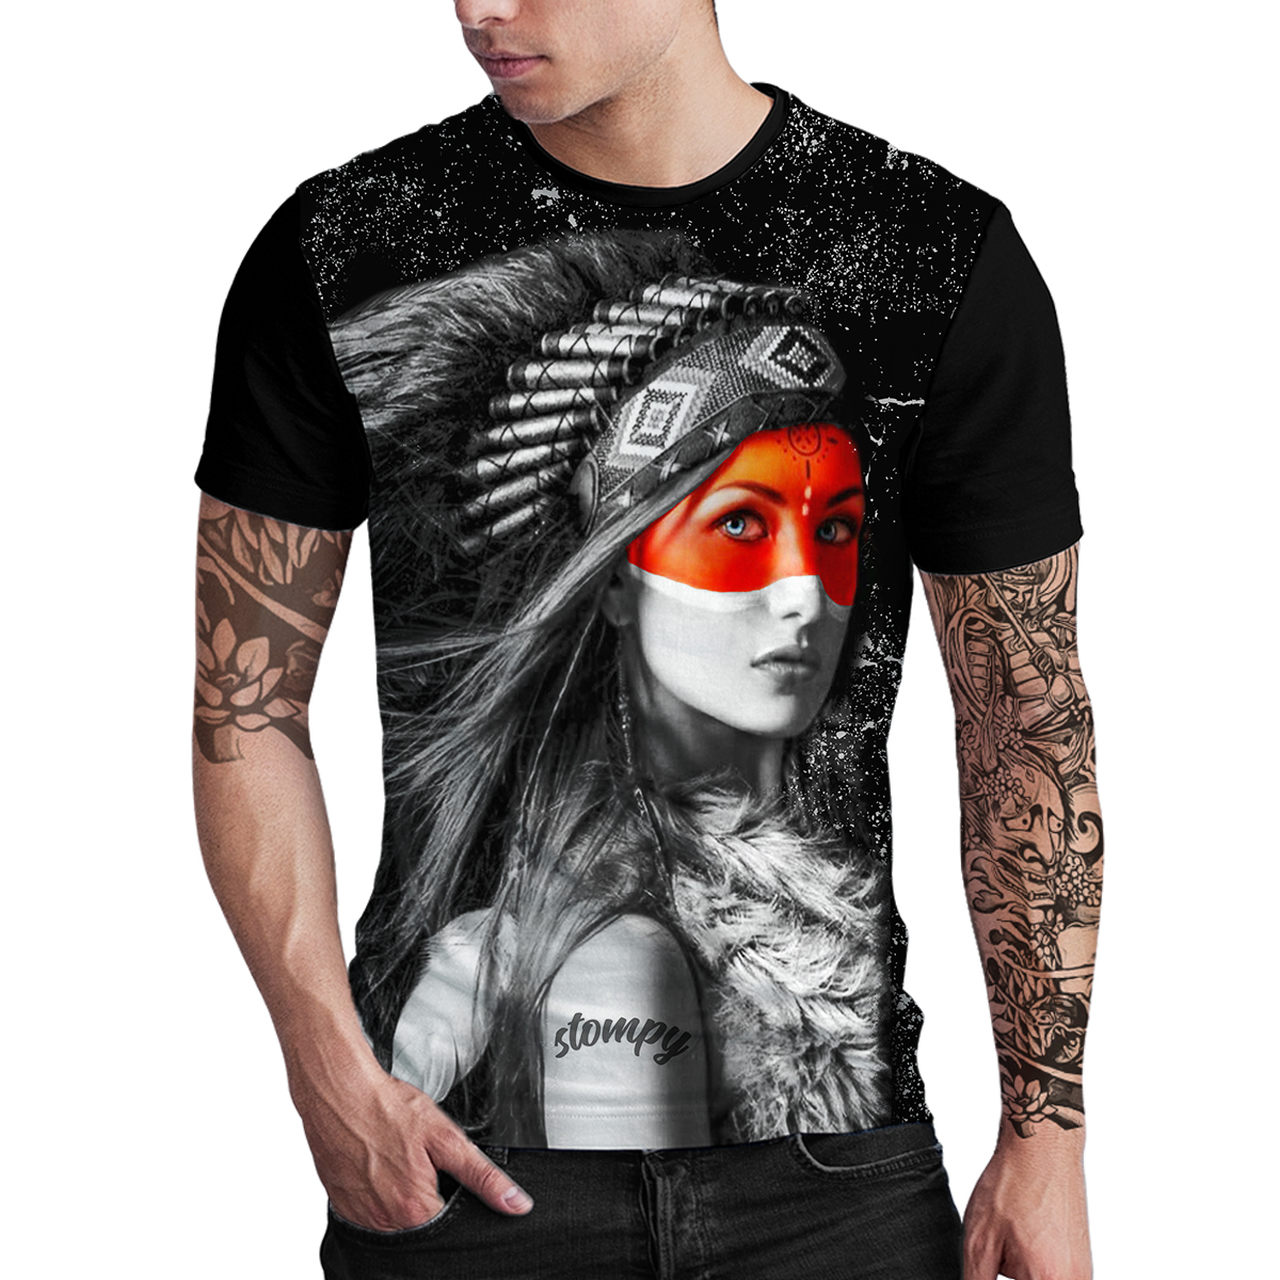 Stompy Camiseta Estampada Masculina Modelo 144